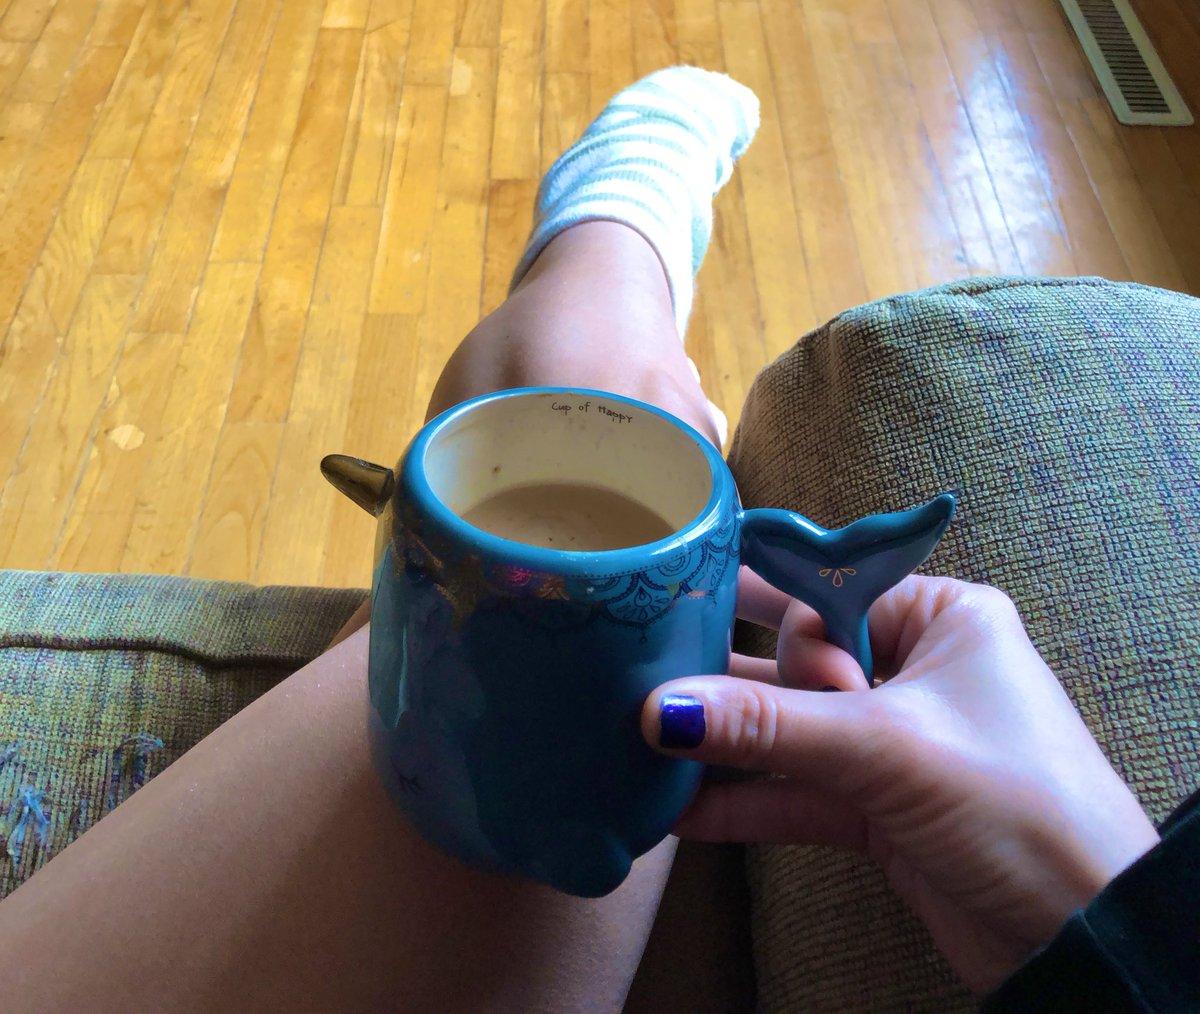 #sundayvibes #SundayMorning #Coffee #cupofhappy